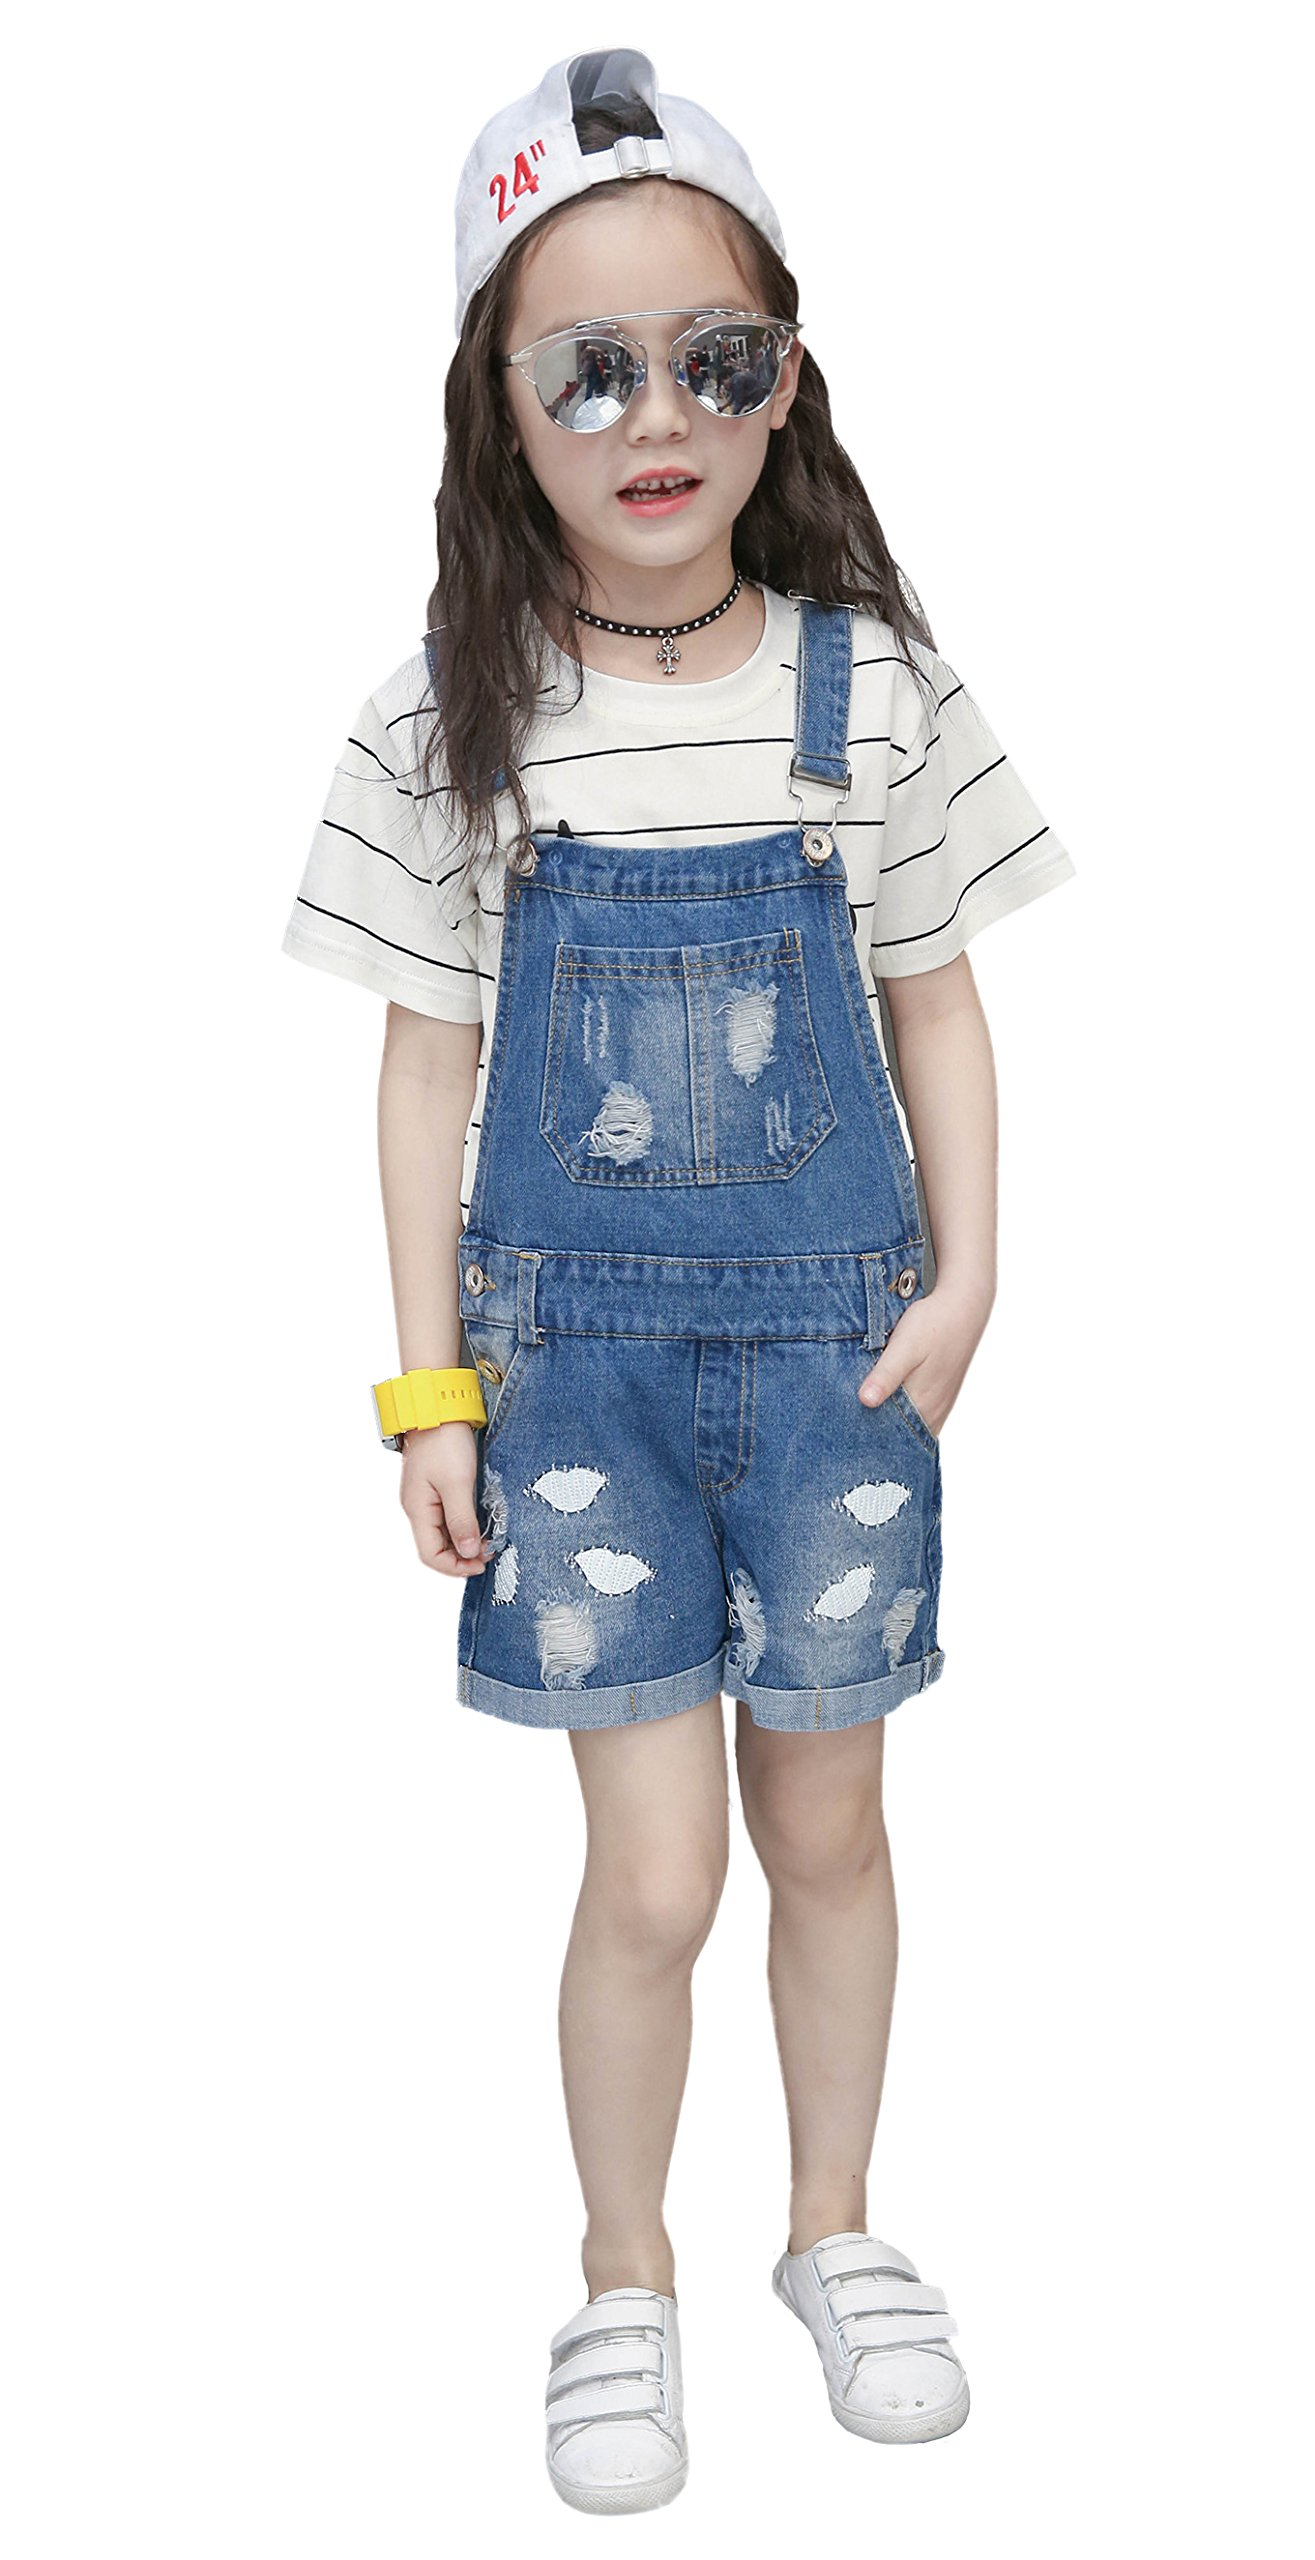 Kidscool Girls Big Bibs Ripped Summer Jeans Shortalls,Light Blue,10-11 Years